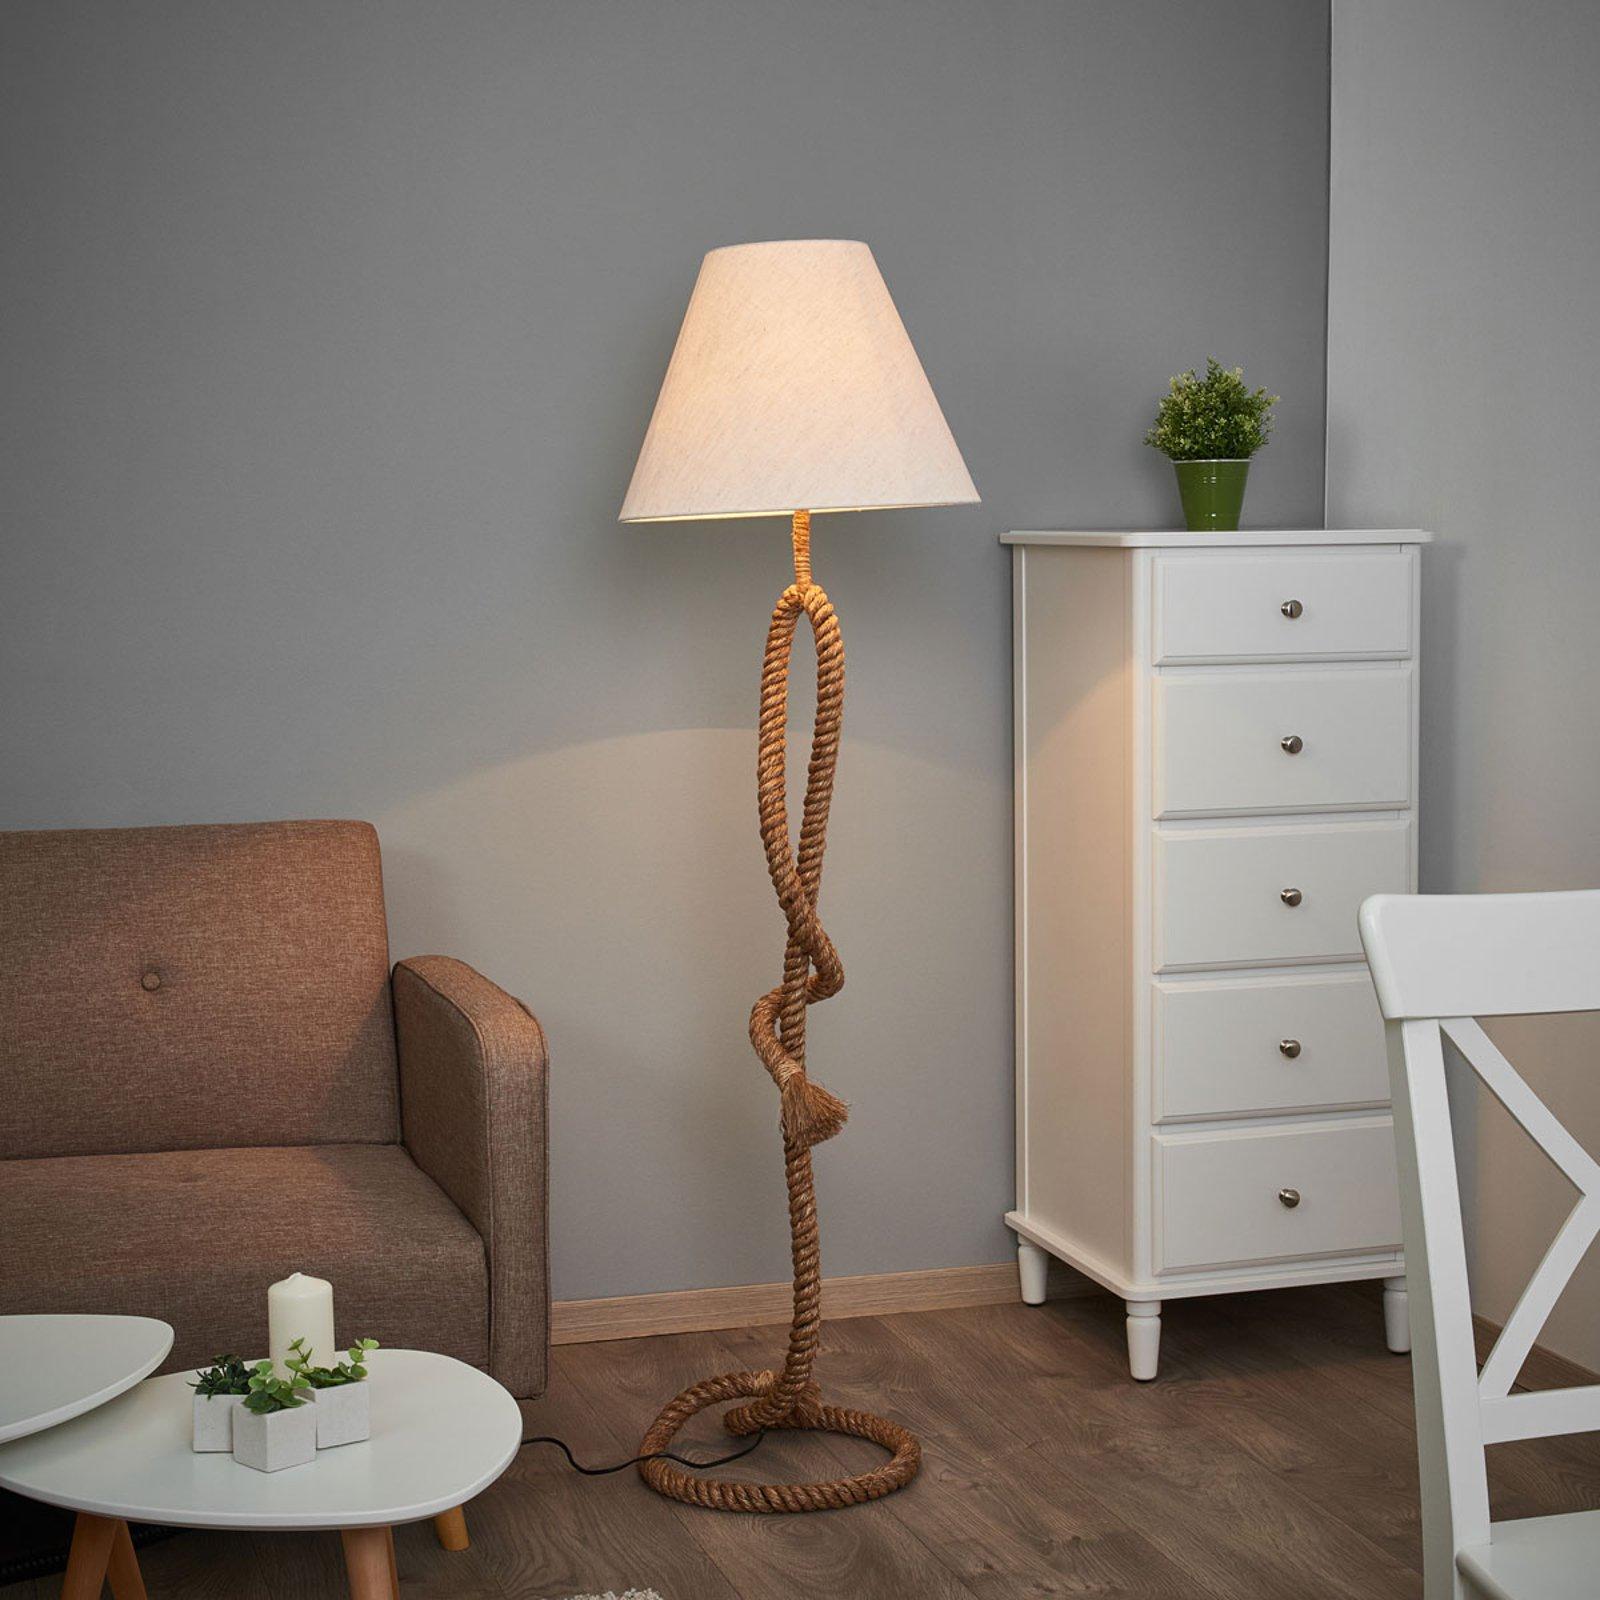 Unik stålampe VICTORIA, 45 cm